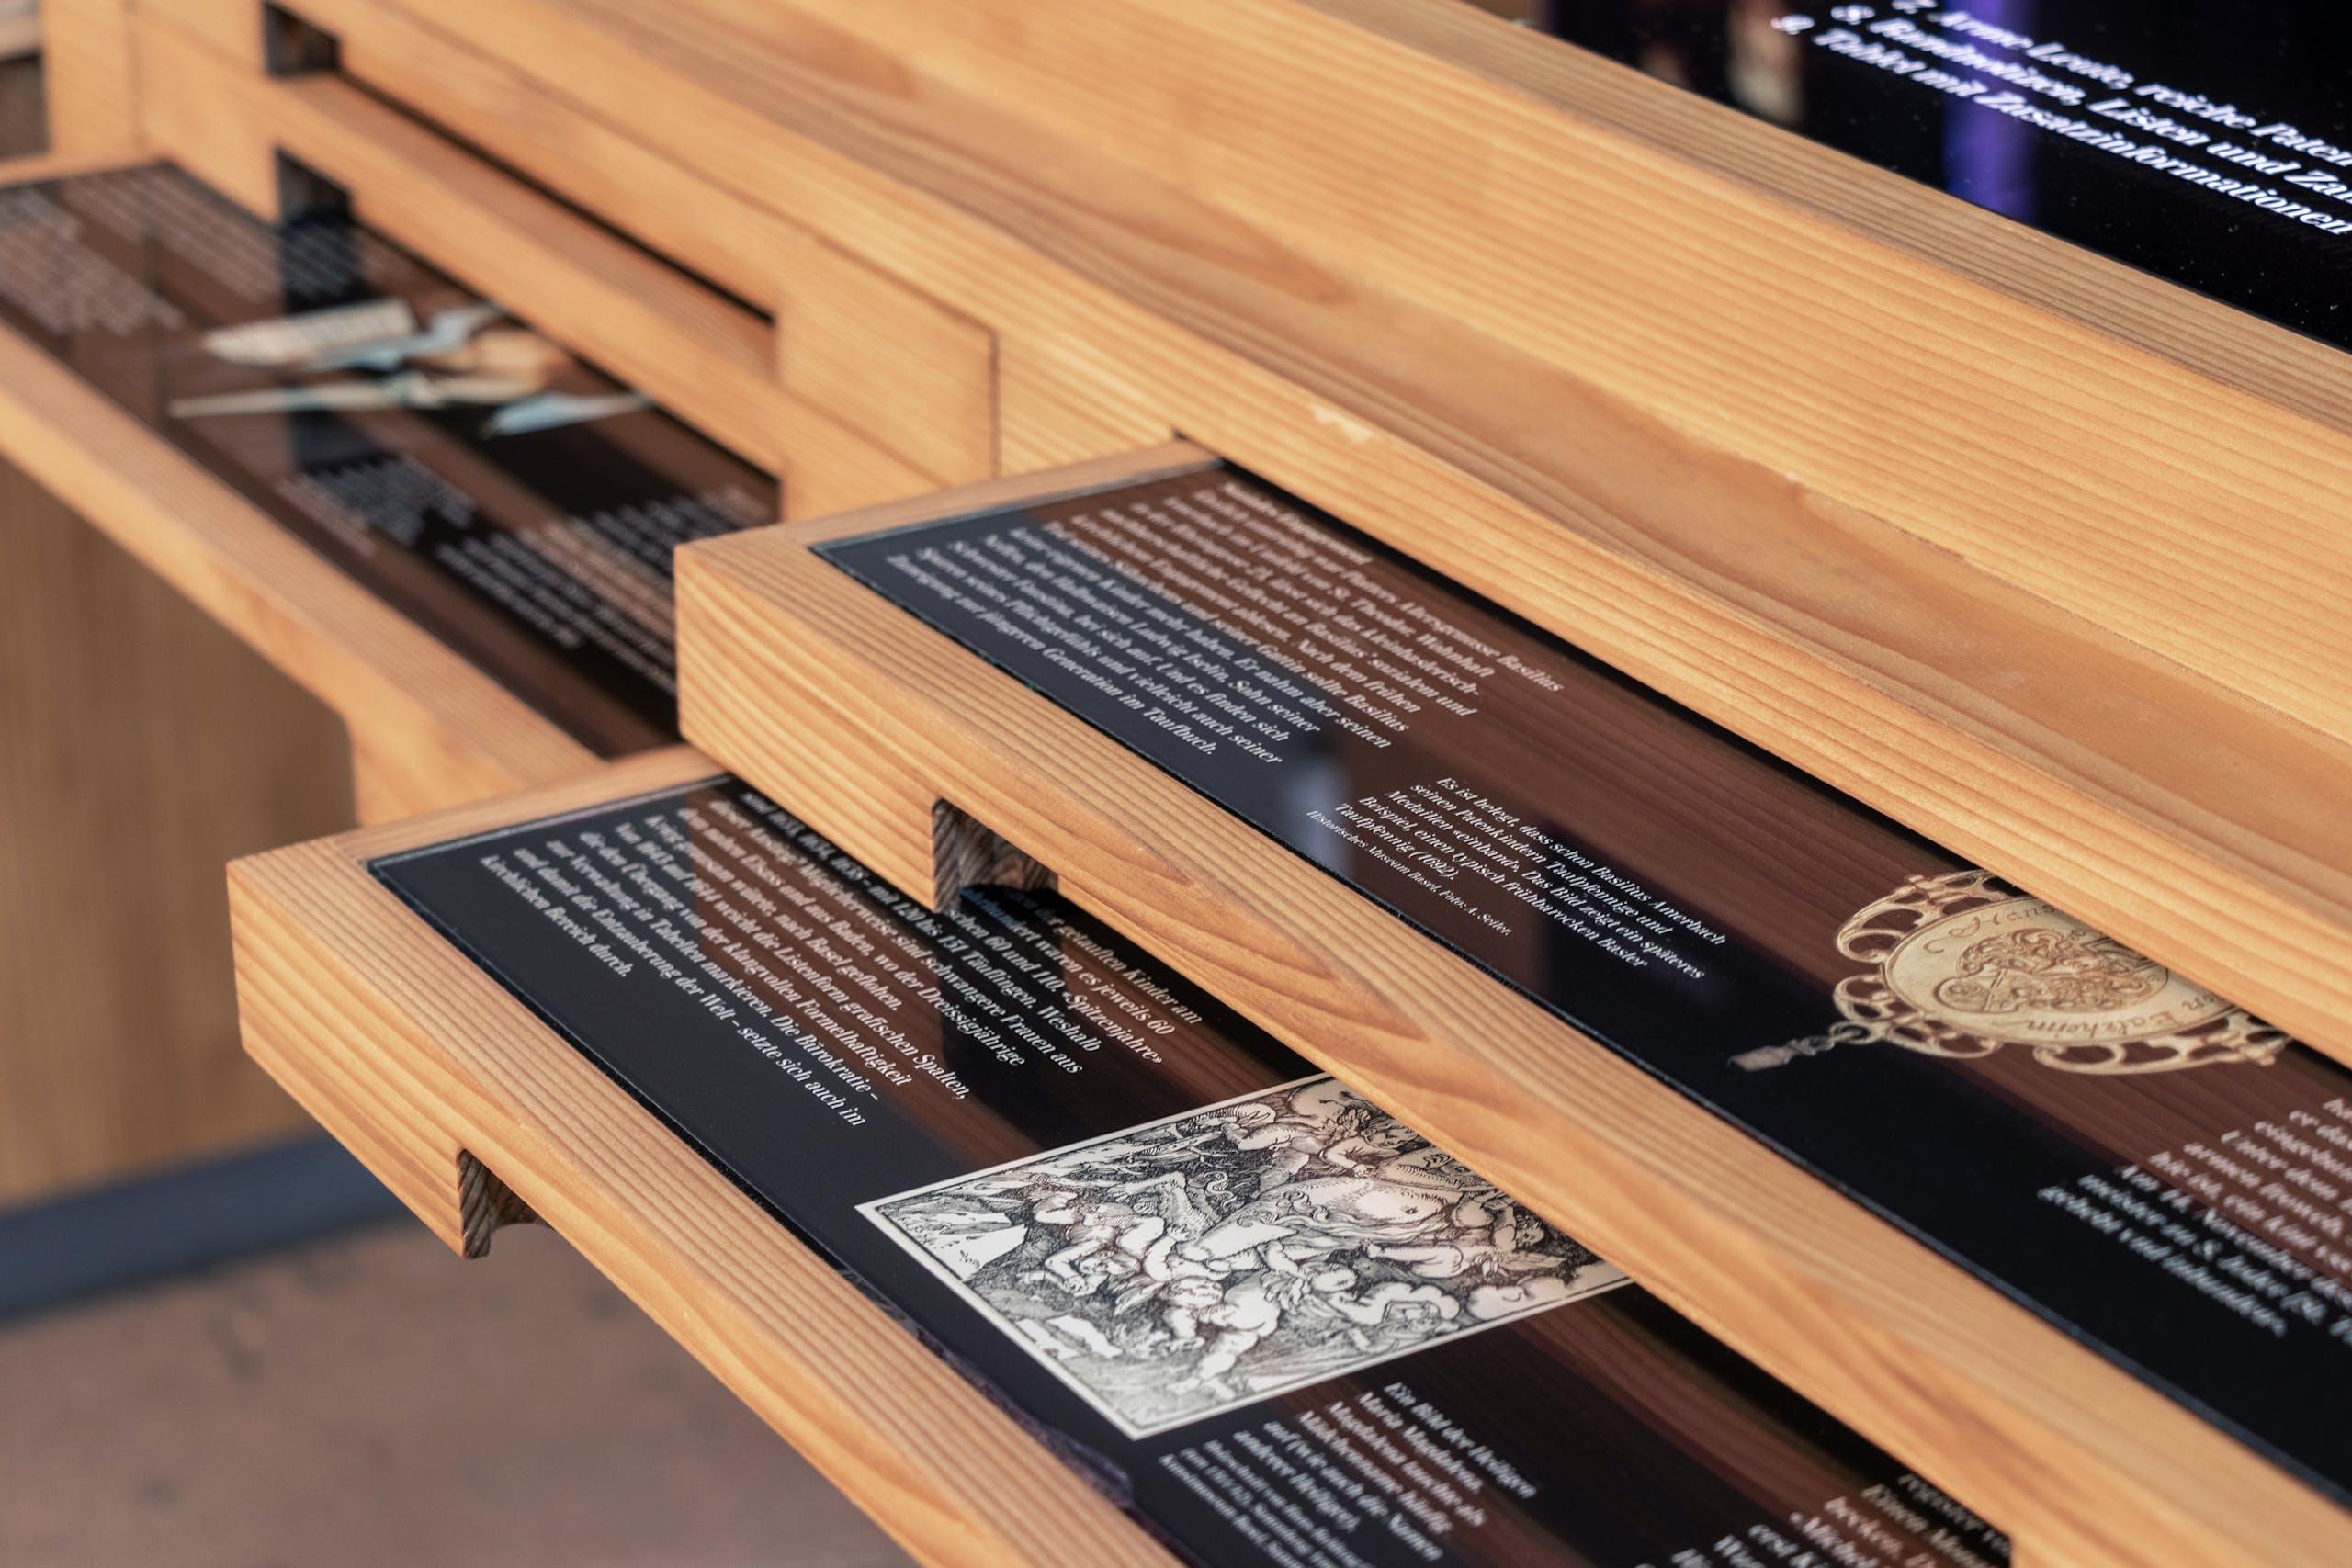 Cedric Kegreiss, Theodorskirche, Vitrine, Grafik, Design, Gestaltung, Basel, Taufbücher, Biebel, Buch, Ausstellung, Visual Design, Barbara Piatti